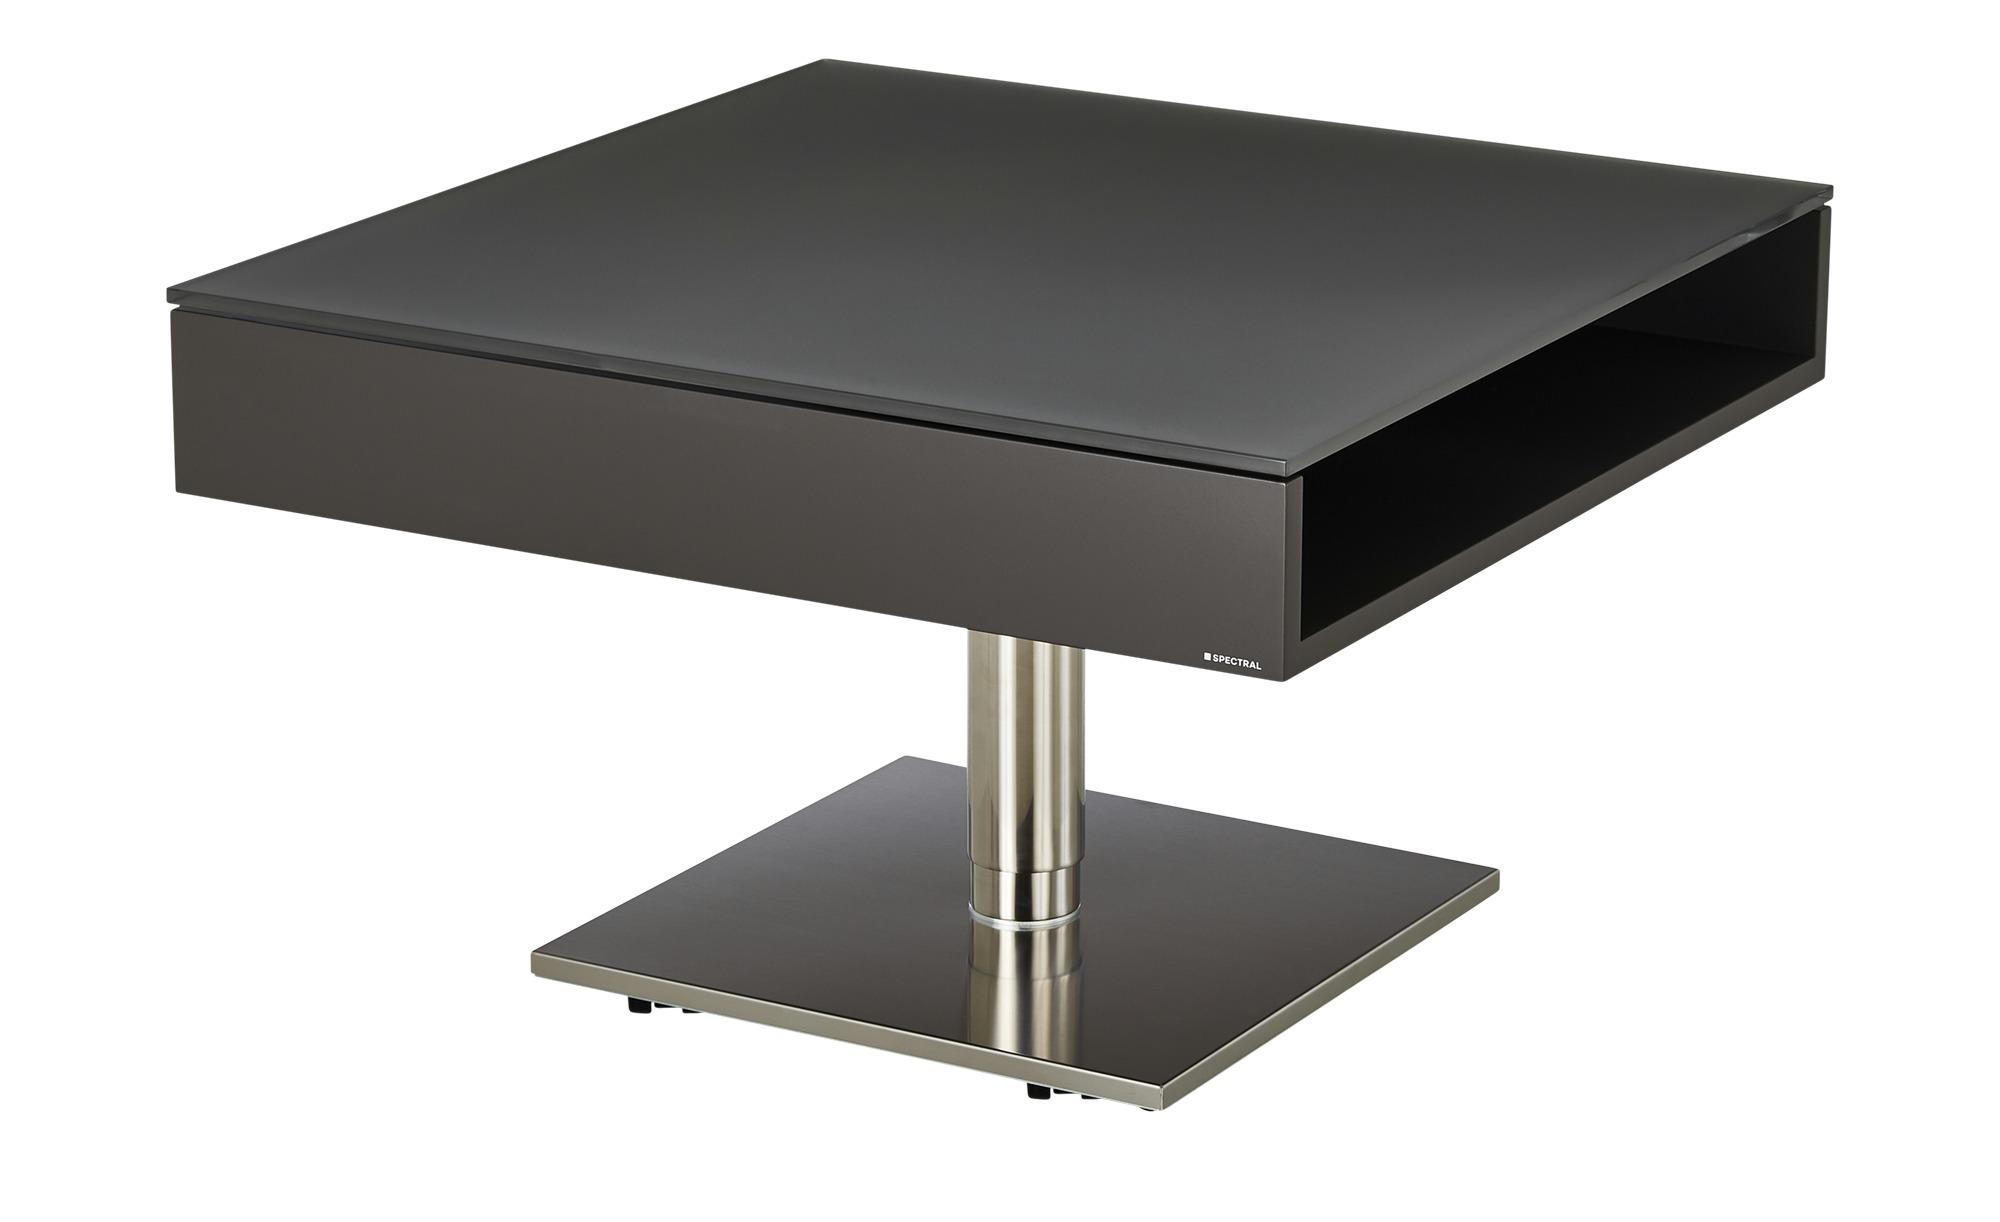 SPECTRAL Couchtisch  Tables ¦ Maße (cm): B: 75 H: 45 T: 75 Tische > Couchtische > Couchtische rechteckig - Höffner